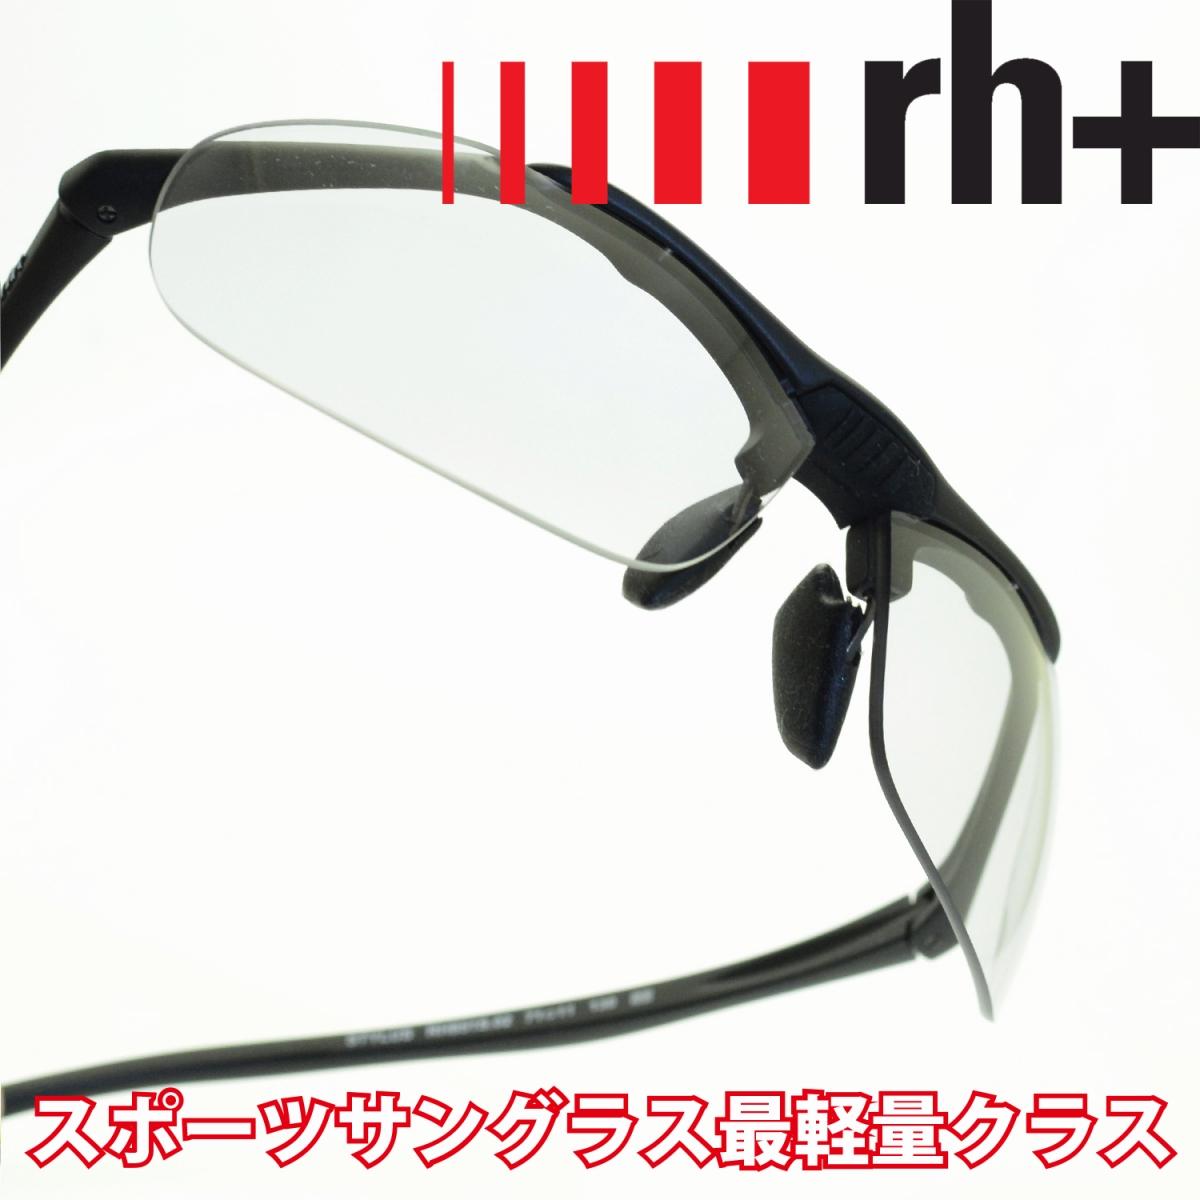 rh+ アールエイチプラス STYLUS JAPAN Small RH851S51